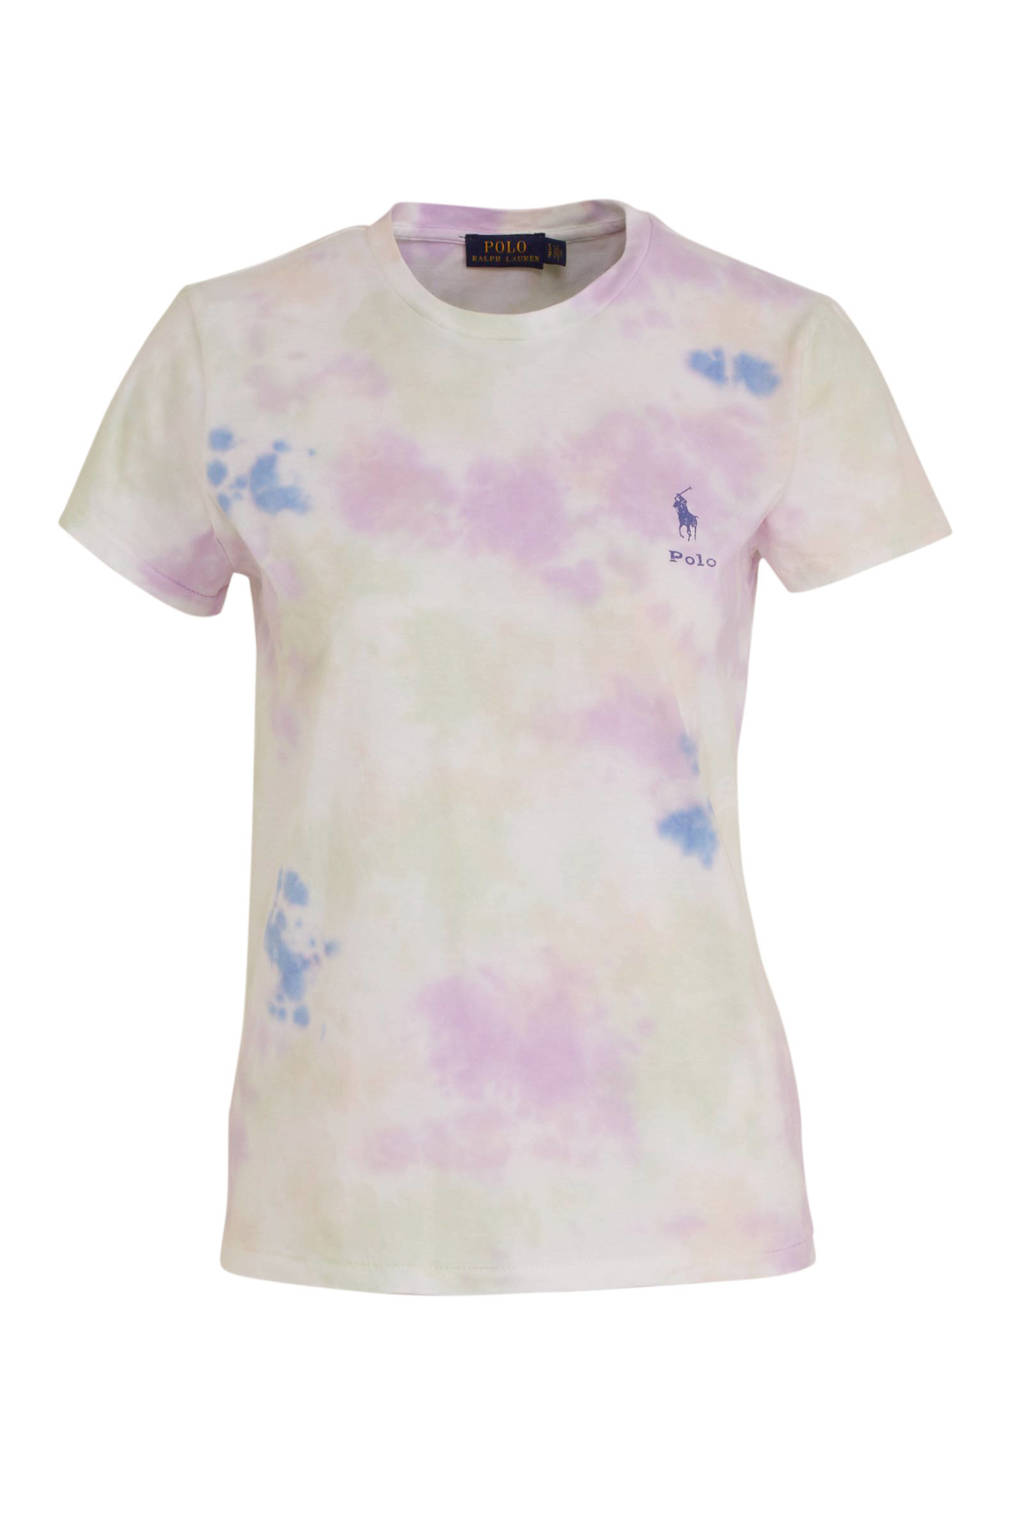 POLO Ralph Lauren tie-dye T-shirt roze/geel, Roze/geel